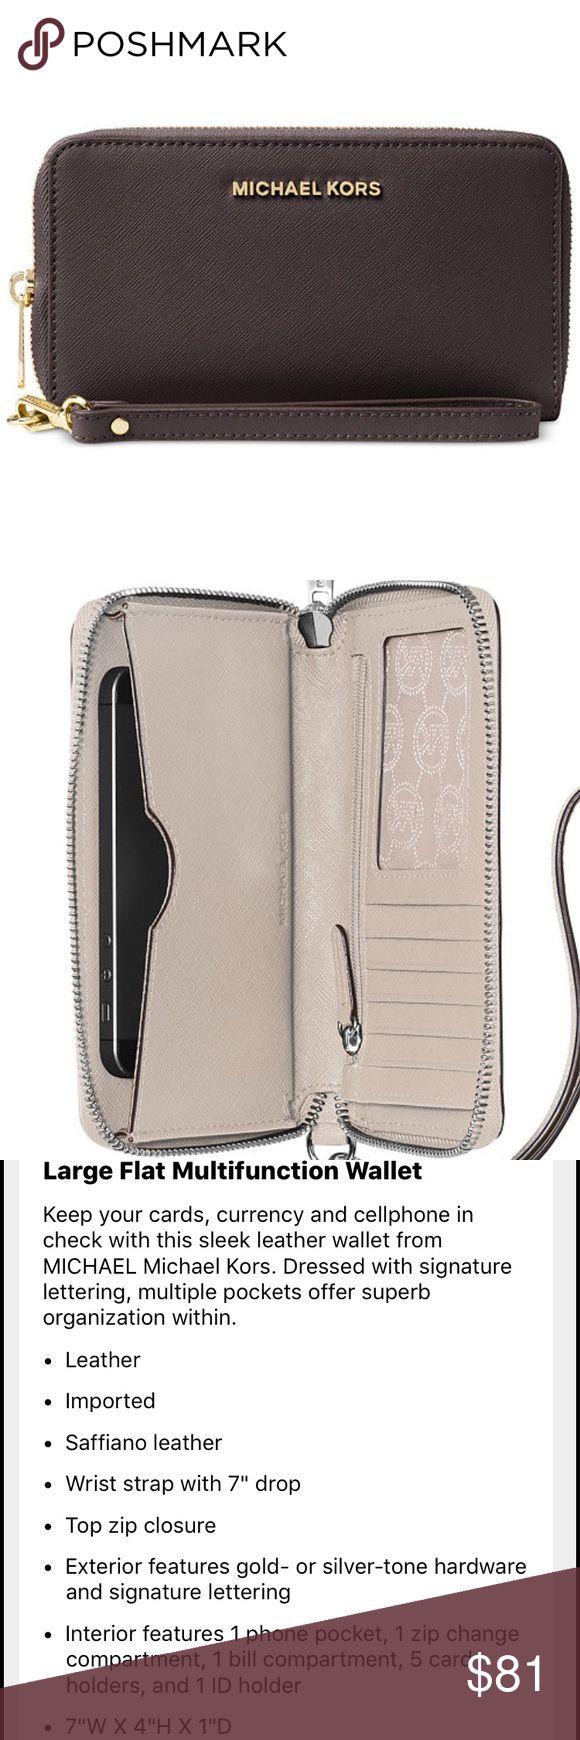 b6550bced78e Michael Kors Handbag, Fulton Medium Shoulder Bag This might be it Web ID michael  kors jet set wallet silver ...